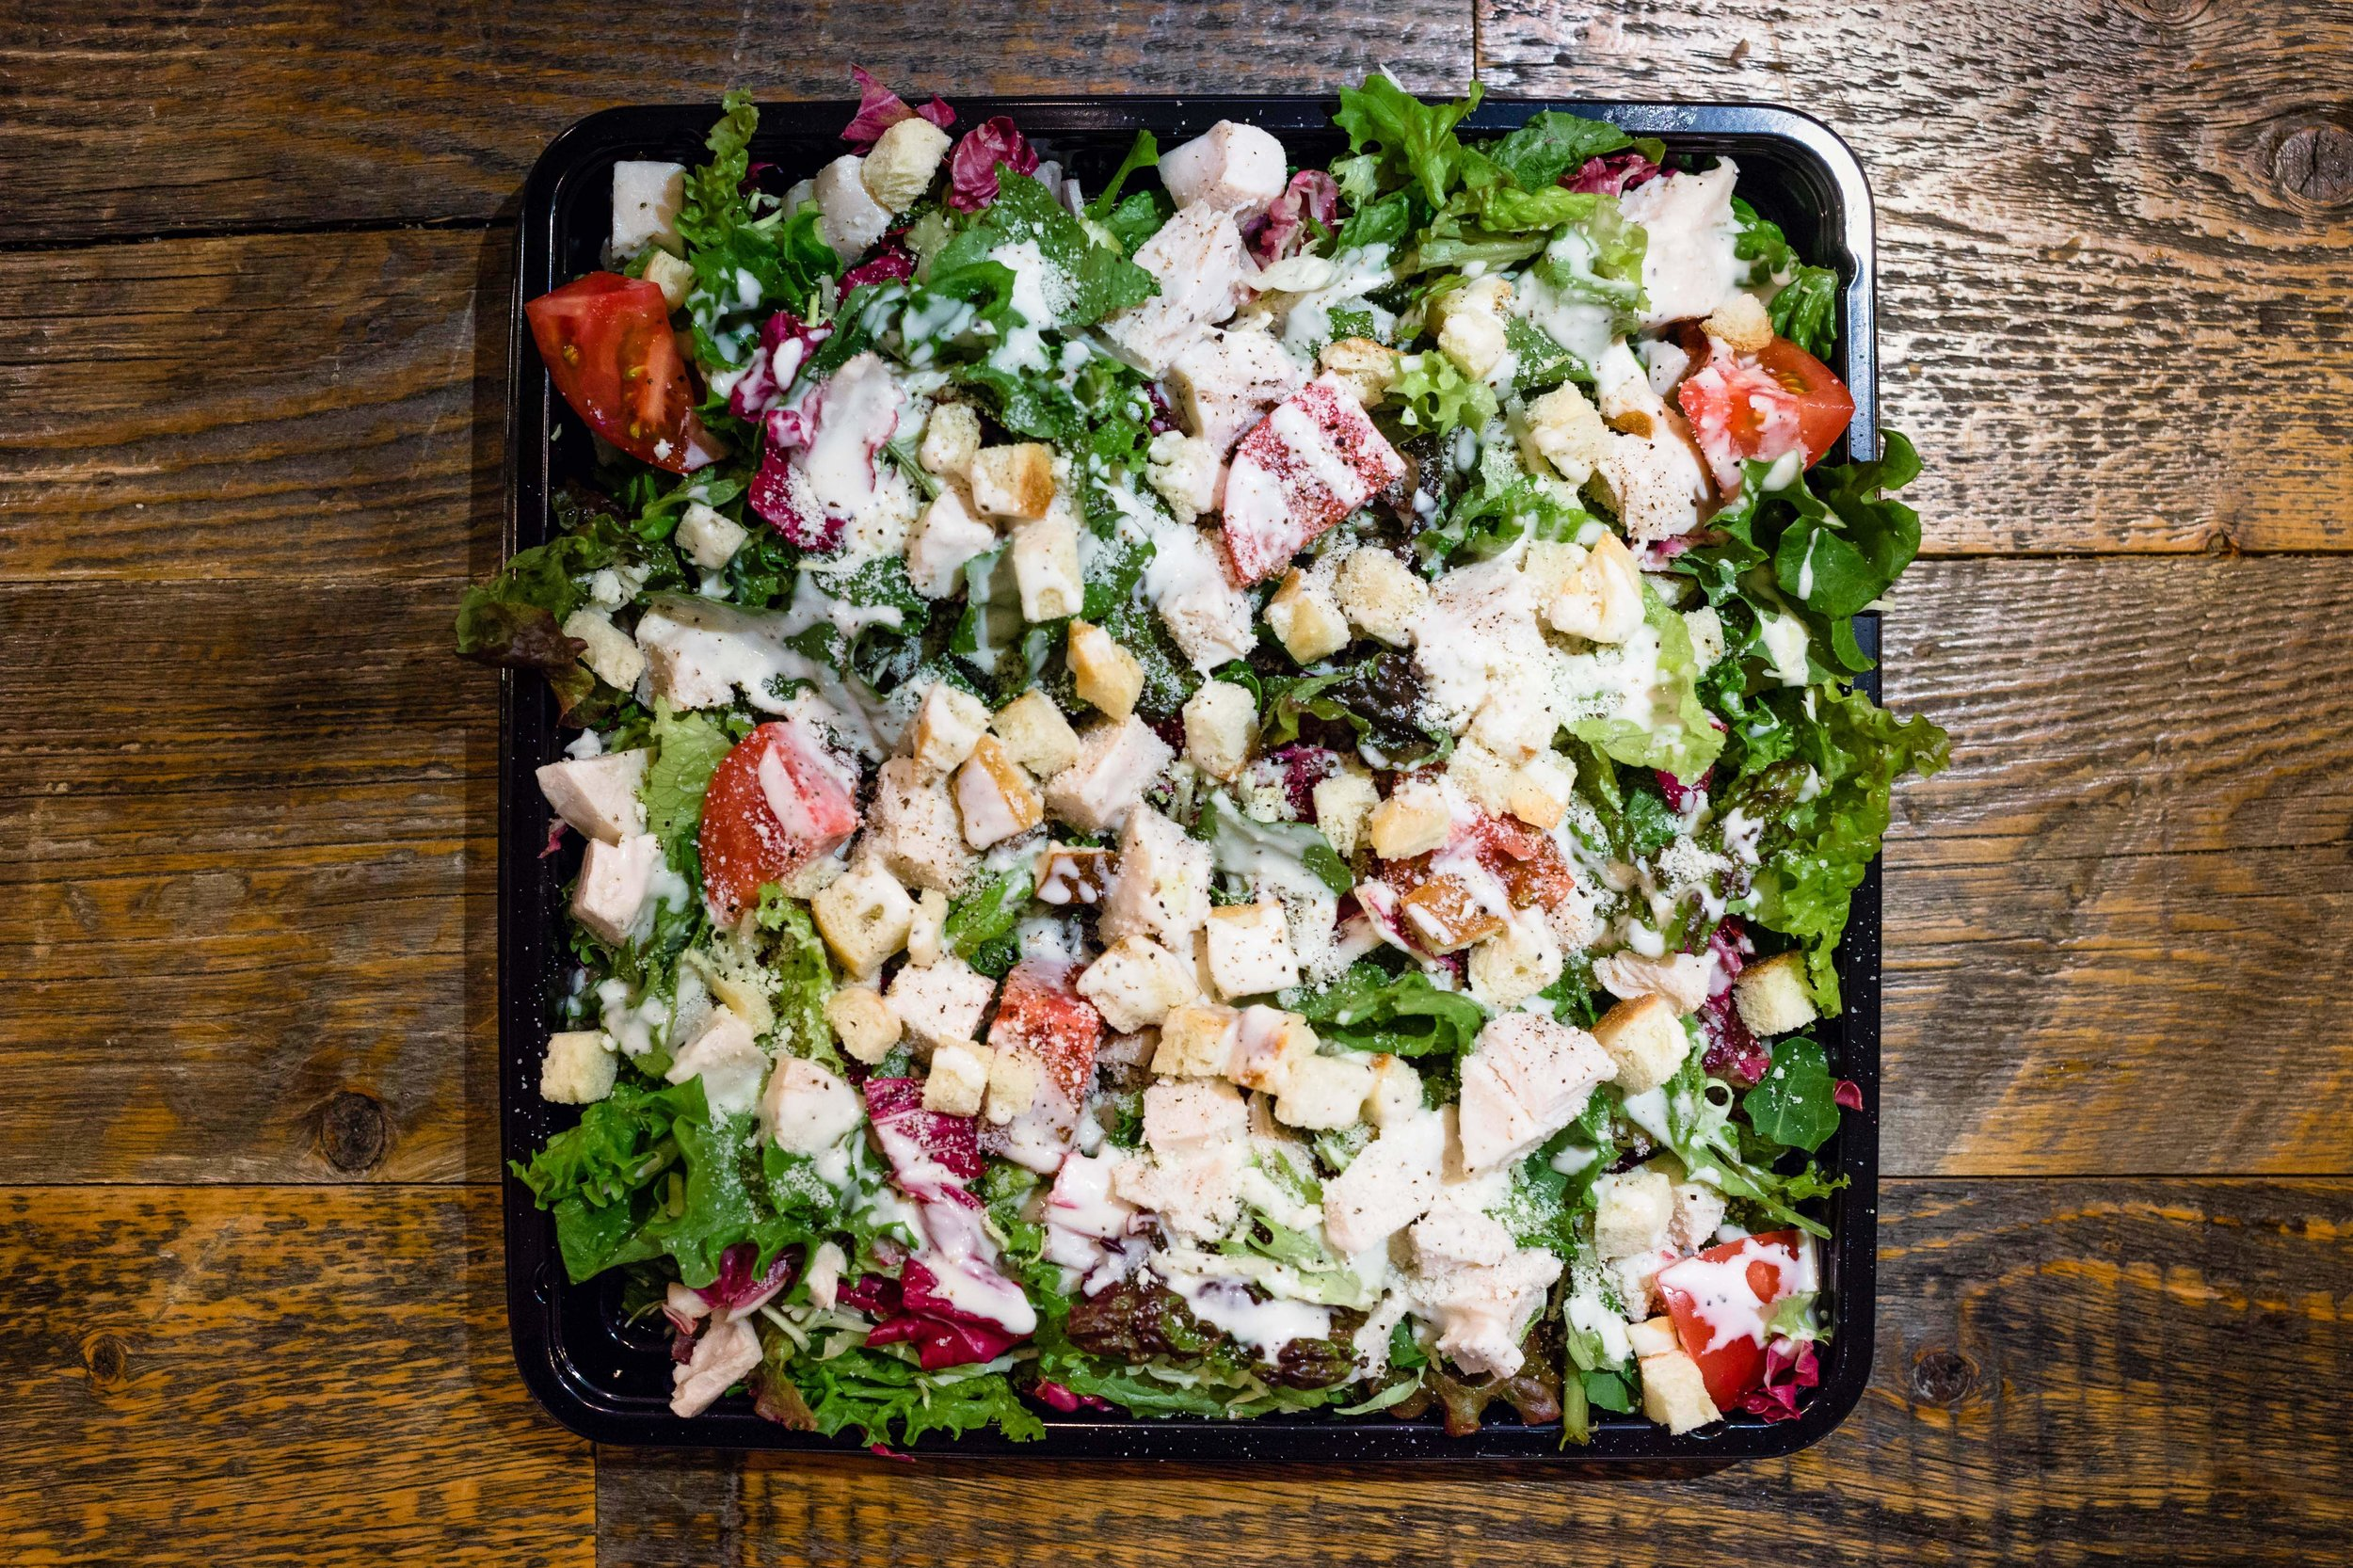 Vegetable Platters - a2zでは自社農園や農家からの直接仕入れにより畑から直送の新鮮なきせつのお野菜を使っています。Meat Platterと合わせてメインの付け合わせとしてのご利用もおススメです。🌱 ベジタリアン、ビーガン対応可能コブサラダ 5名様分 ¥2,800シーザーサラダ 5名様分 ¥2,000季節野菜のディップサラダ 🌱5名様分¥2,500農園野菜のバーニャカウダ 🌱5名様分 ¥2,500農家から直送の新鮮な野菜のグリル自家製のアーモンドとパプリカのロメスコソースと 🌱5名様分 ¥2,300